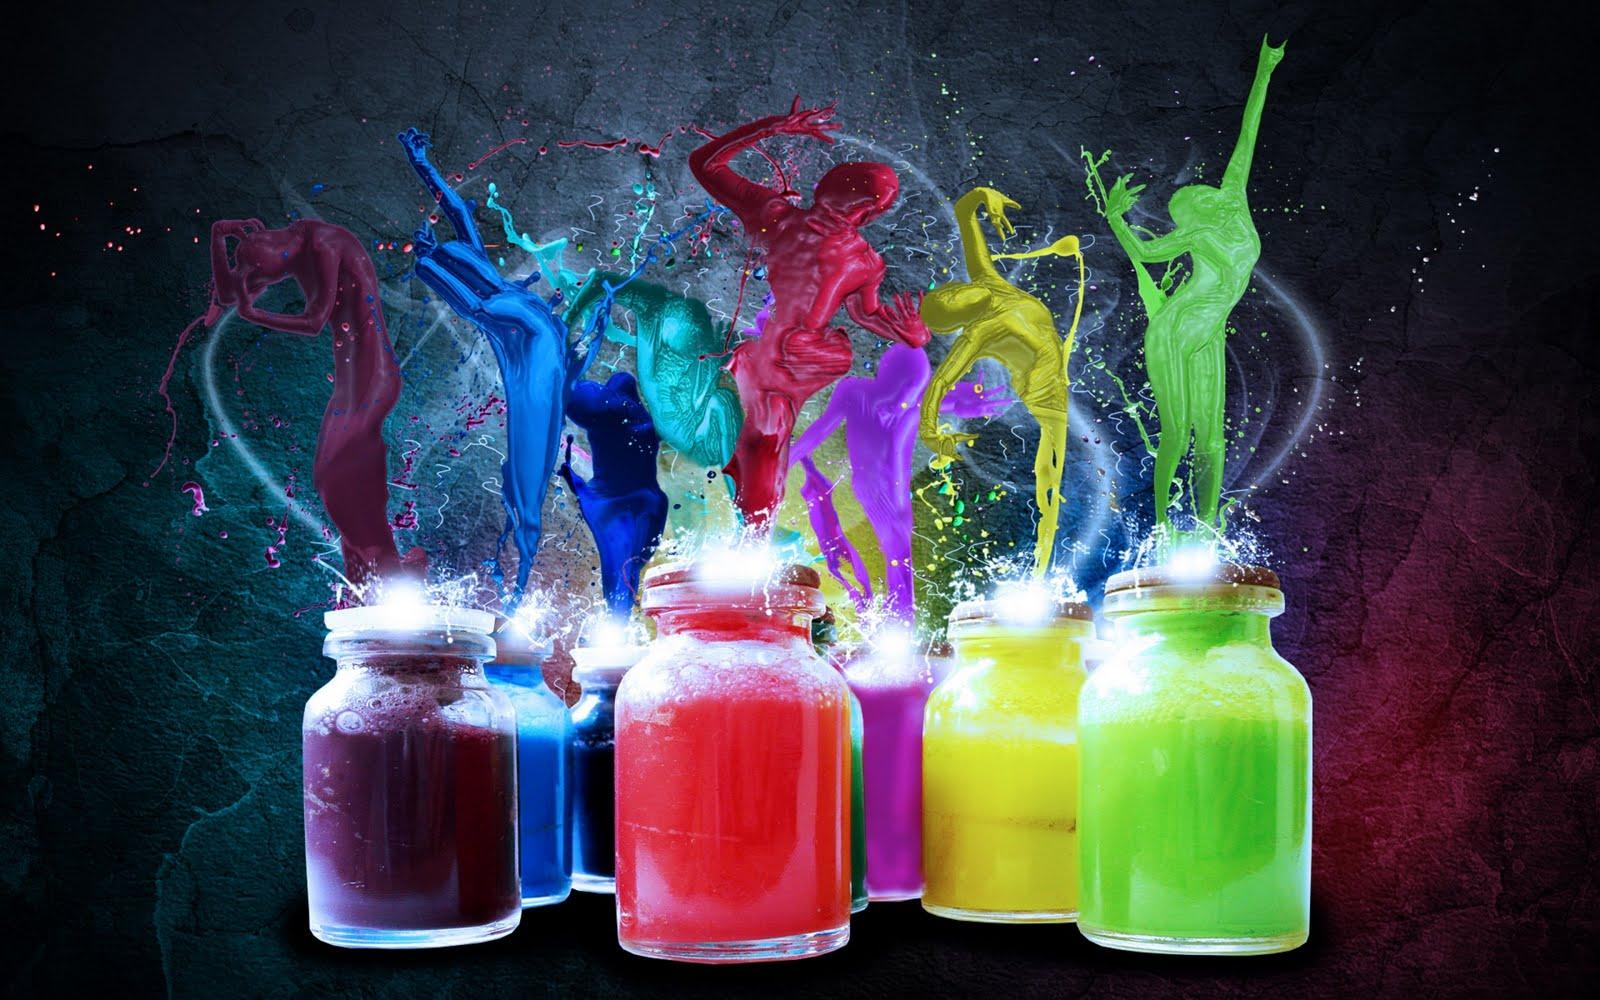 http://3.bp.blogspot.com/-VgiF-KsTcYU/UR2bZ7vTYTI/AAAAAAAAAHU/8xa-94bjVjE/s1600/Download-colorful-wallpaper-dancing-colors-wallpaper.jpg